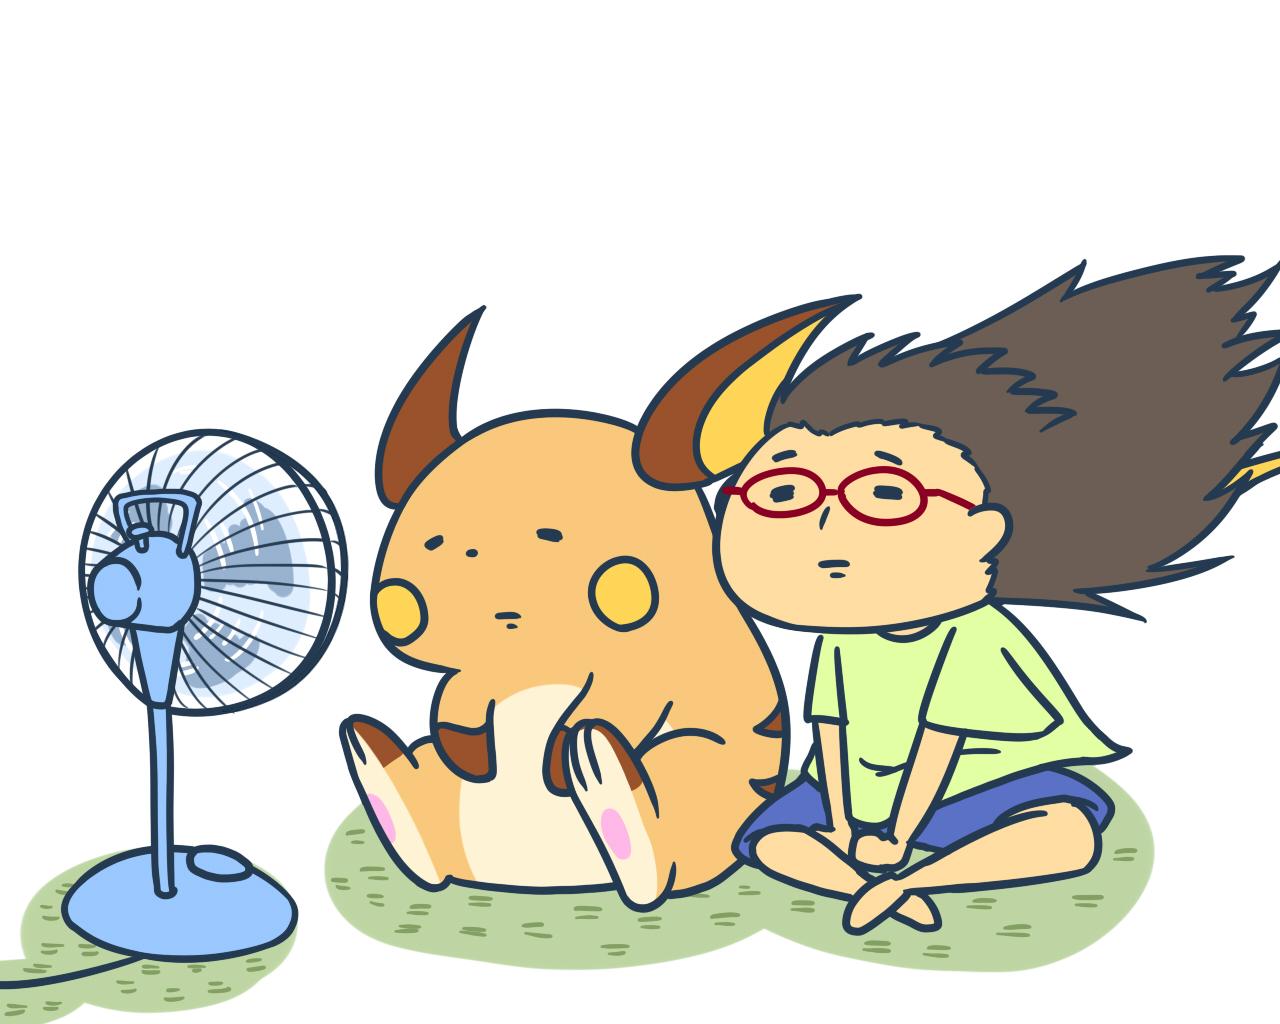 1280x1024 Raichu And Some Random Girl Get Cool Down By An Fan.